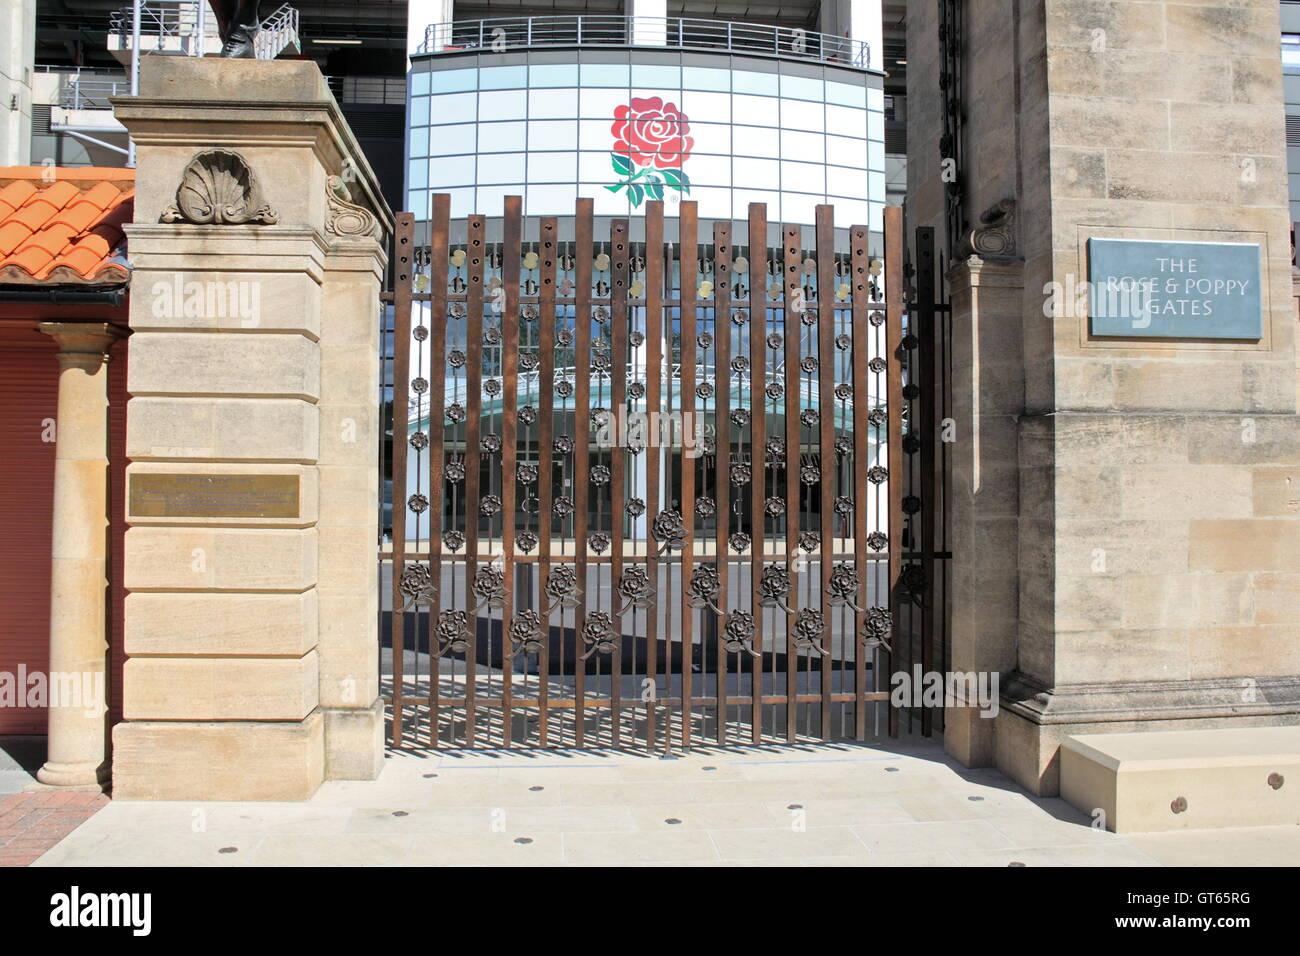 Rose and Poppy Gates, West Stand, Twickenham Stadium, Greater London, England, Great Britain, United Kingdom UK, - Stock Image